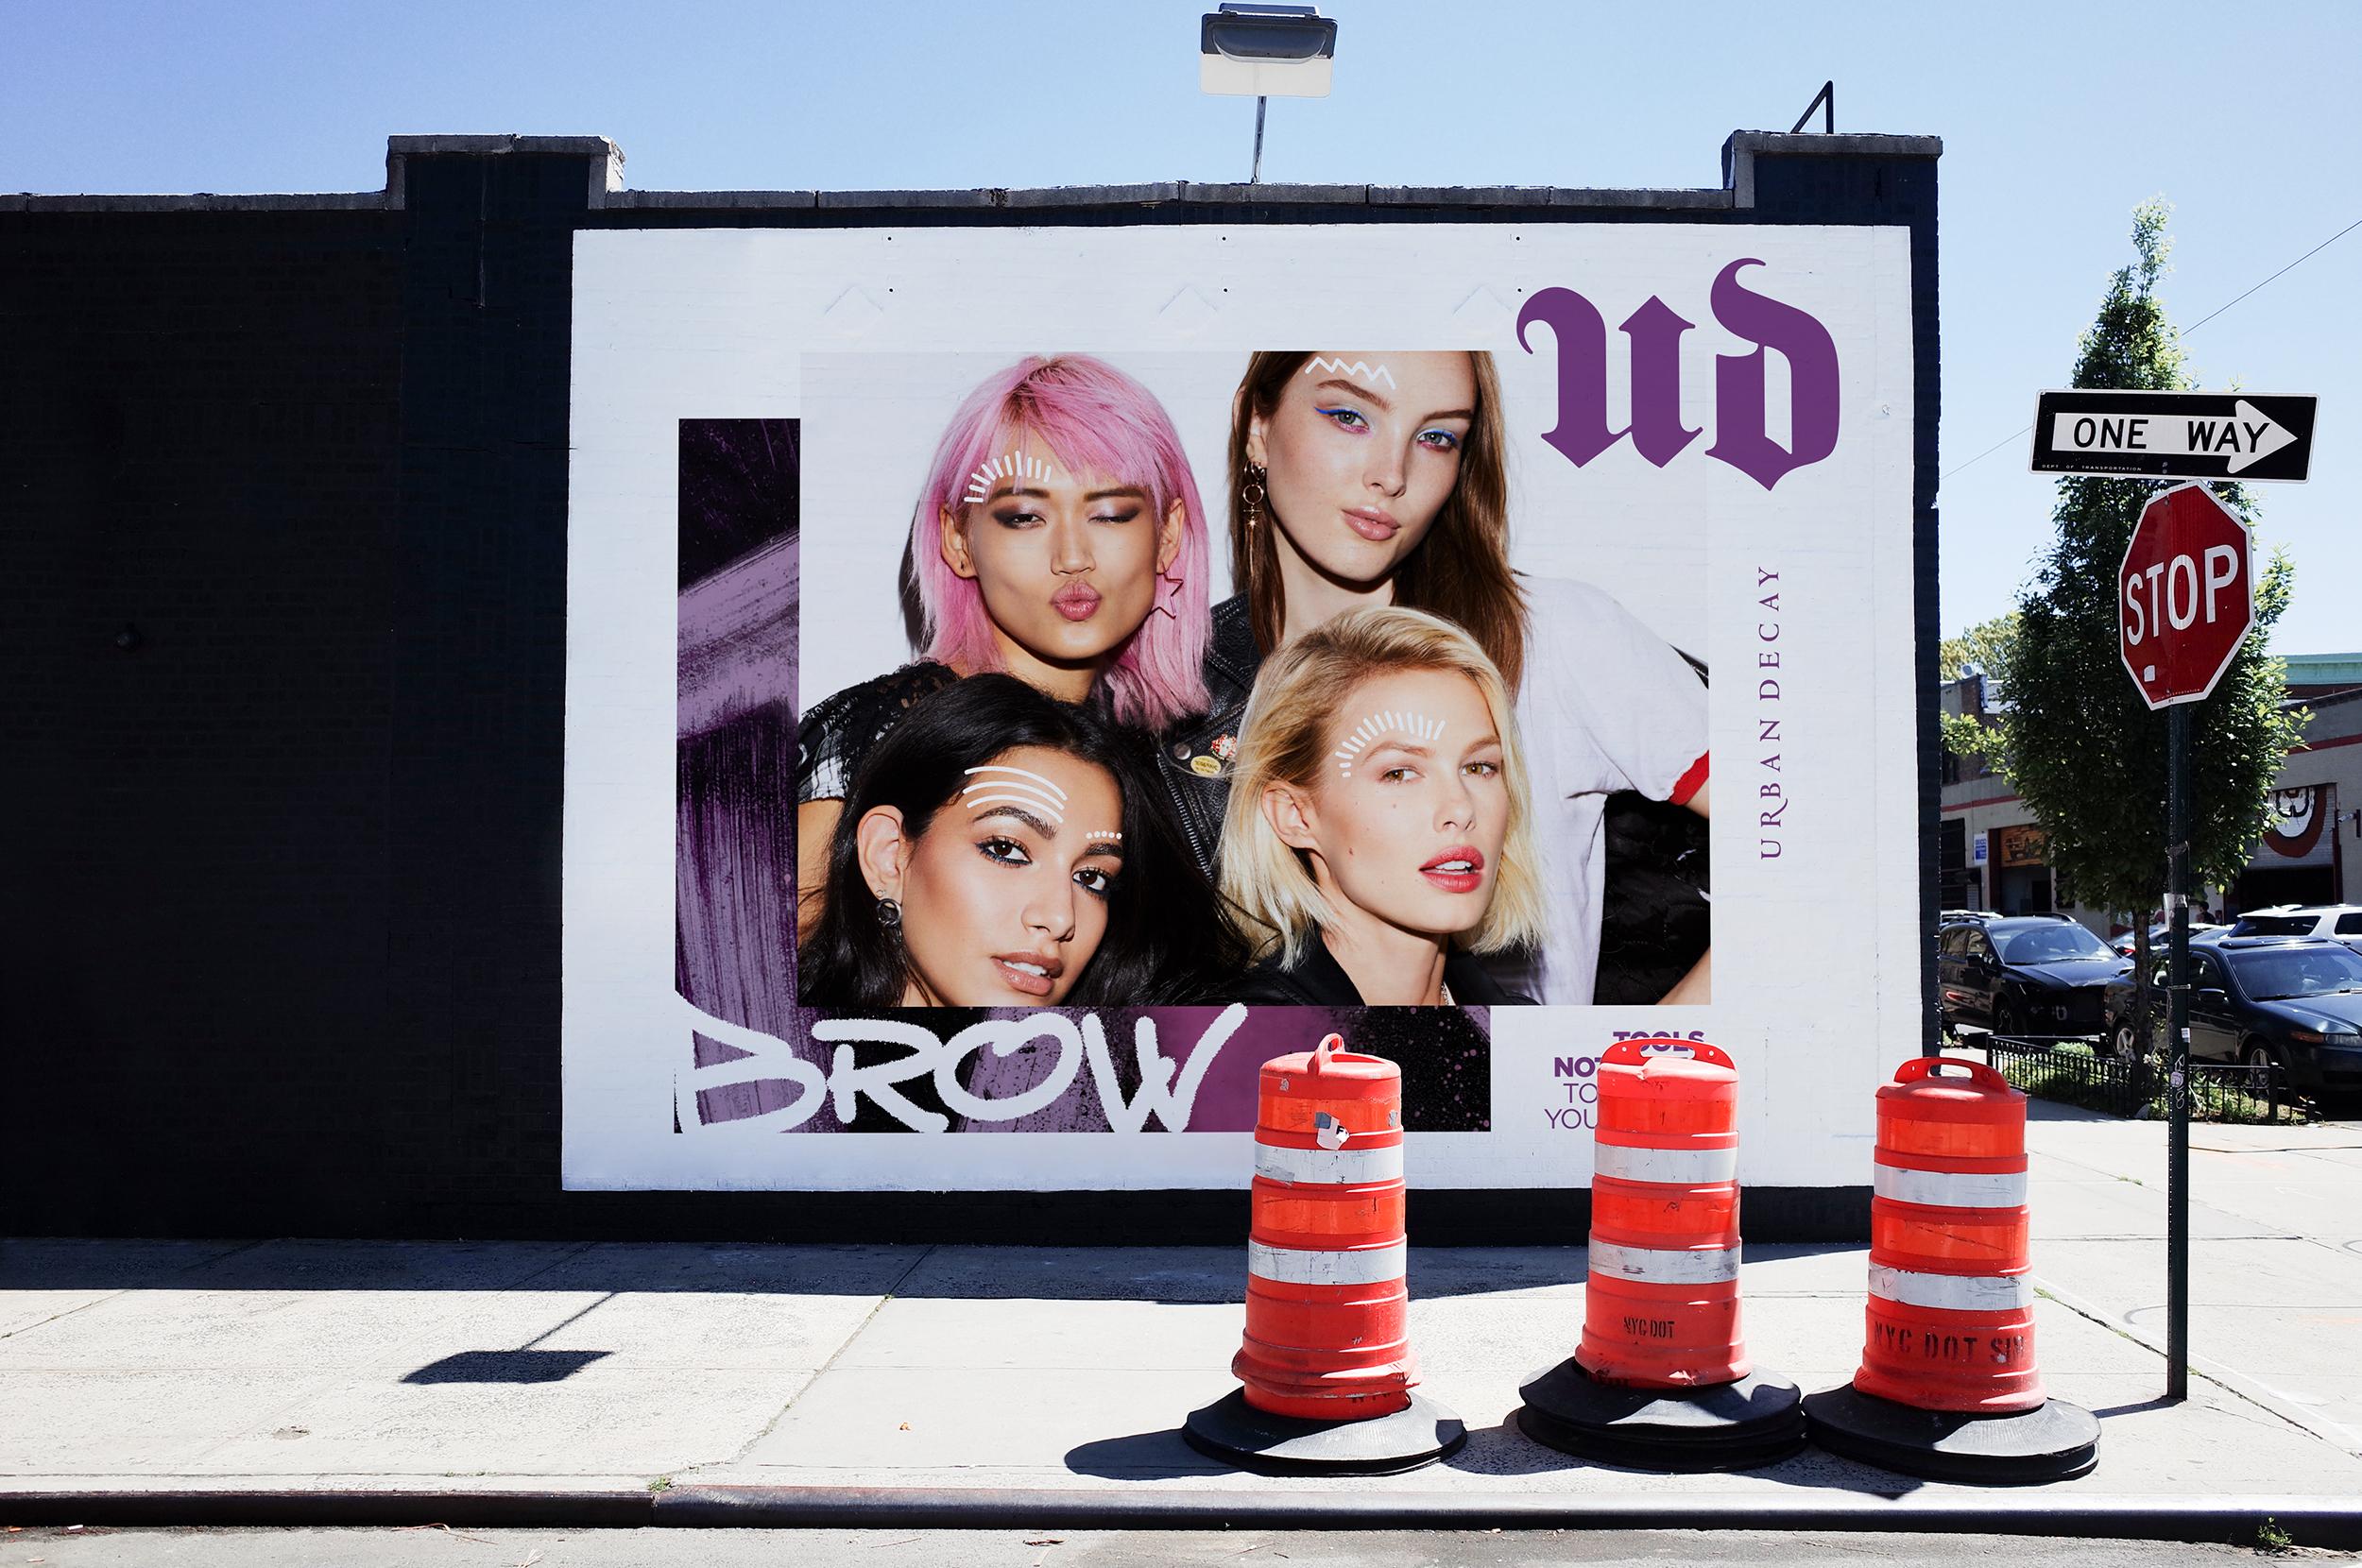 Brow_billboard.jpg